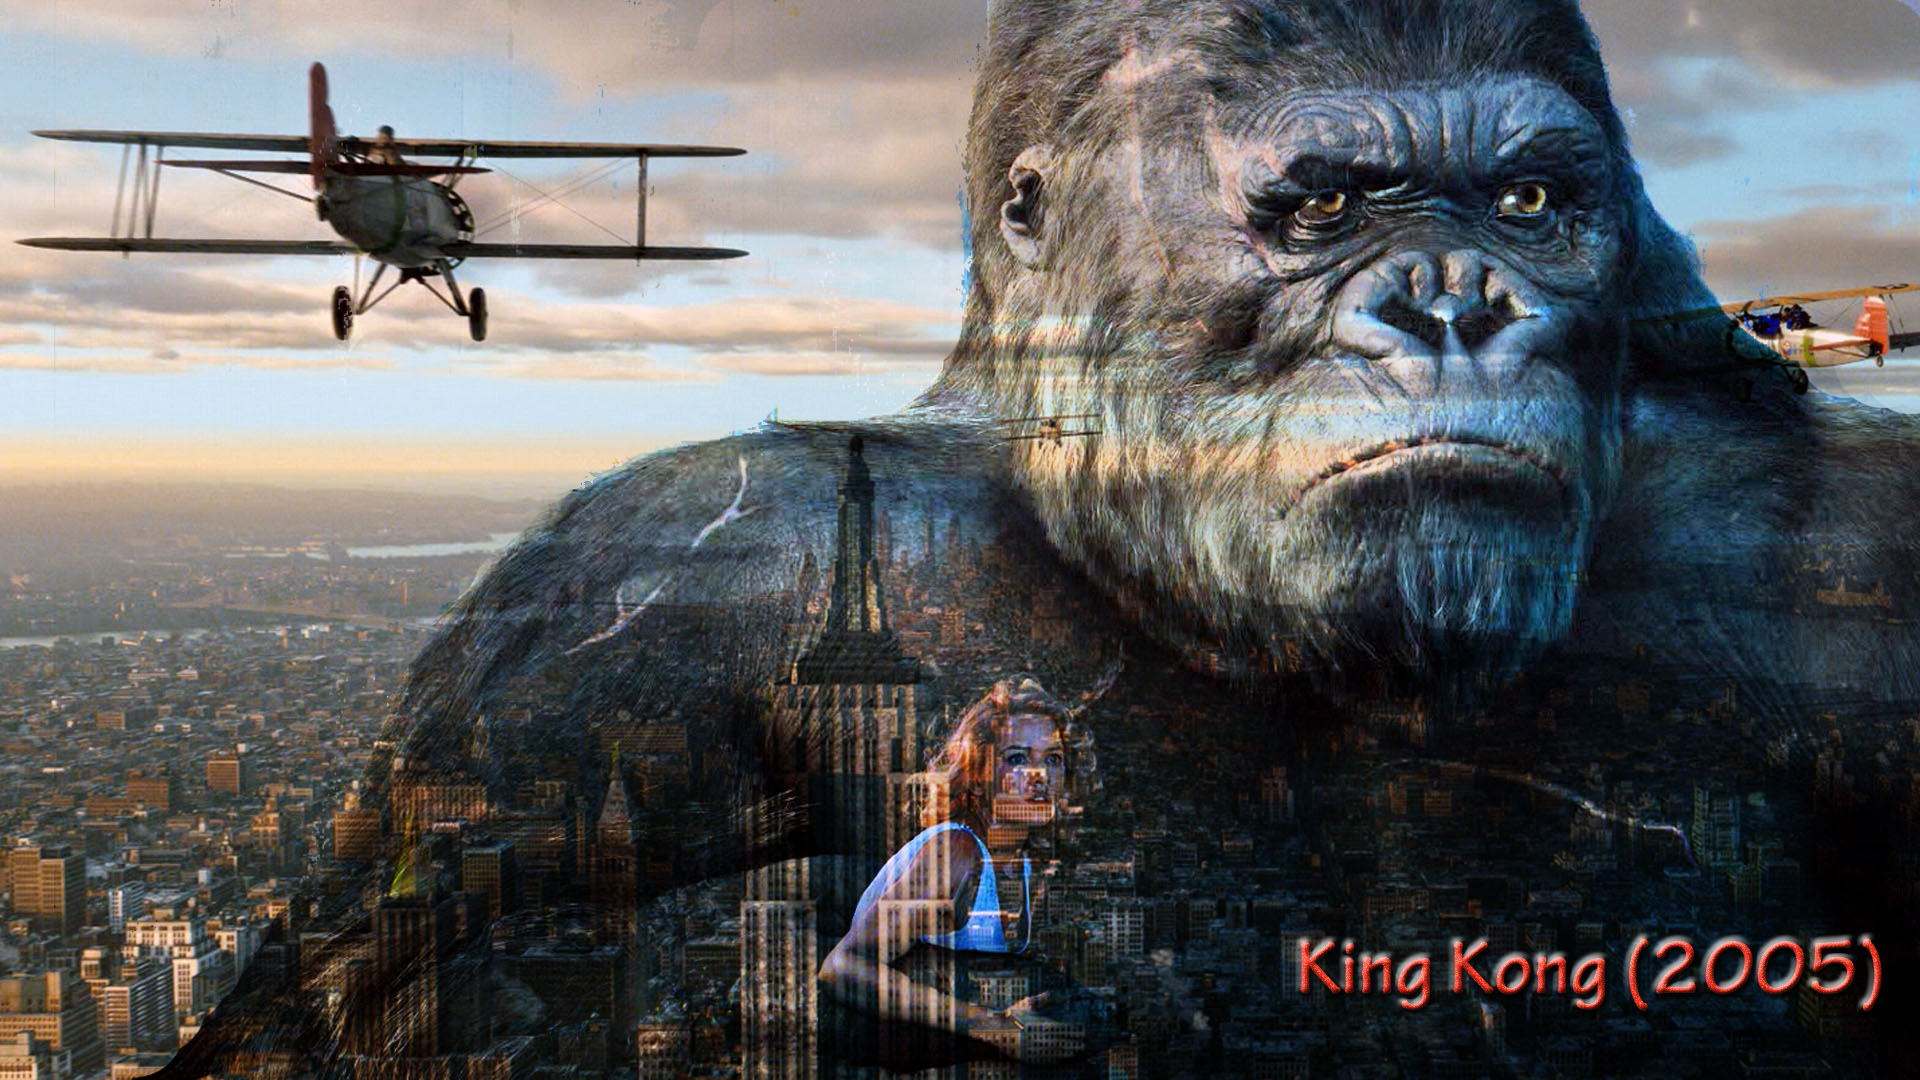 King Kong 2005 - Movies Wallpaper (34783047) - Fanpop